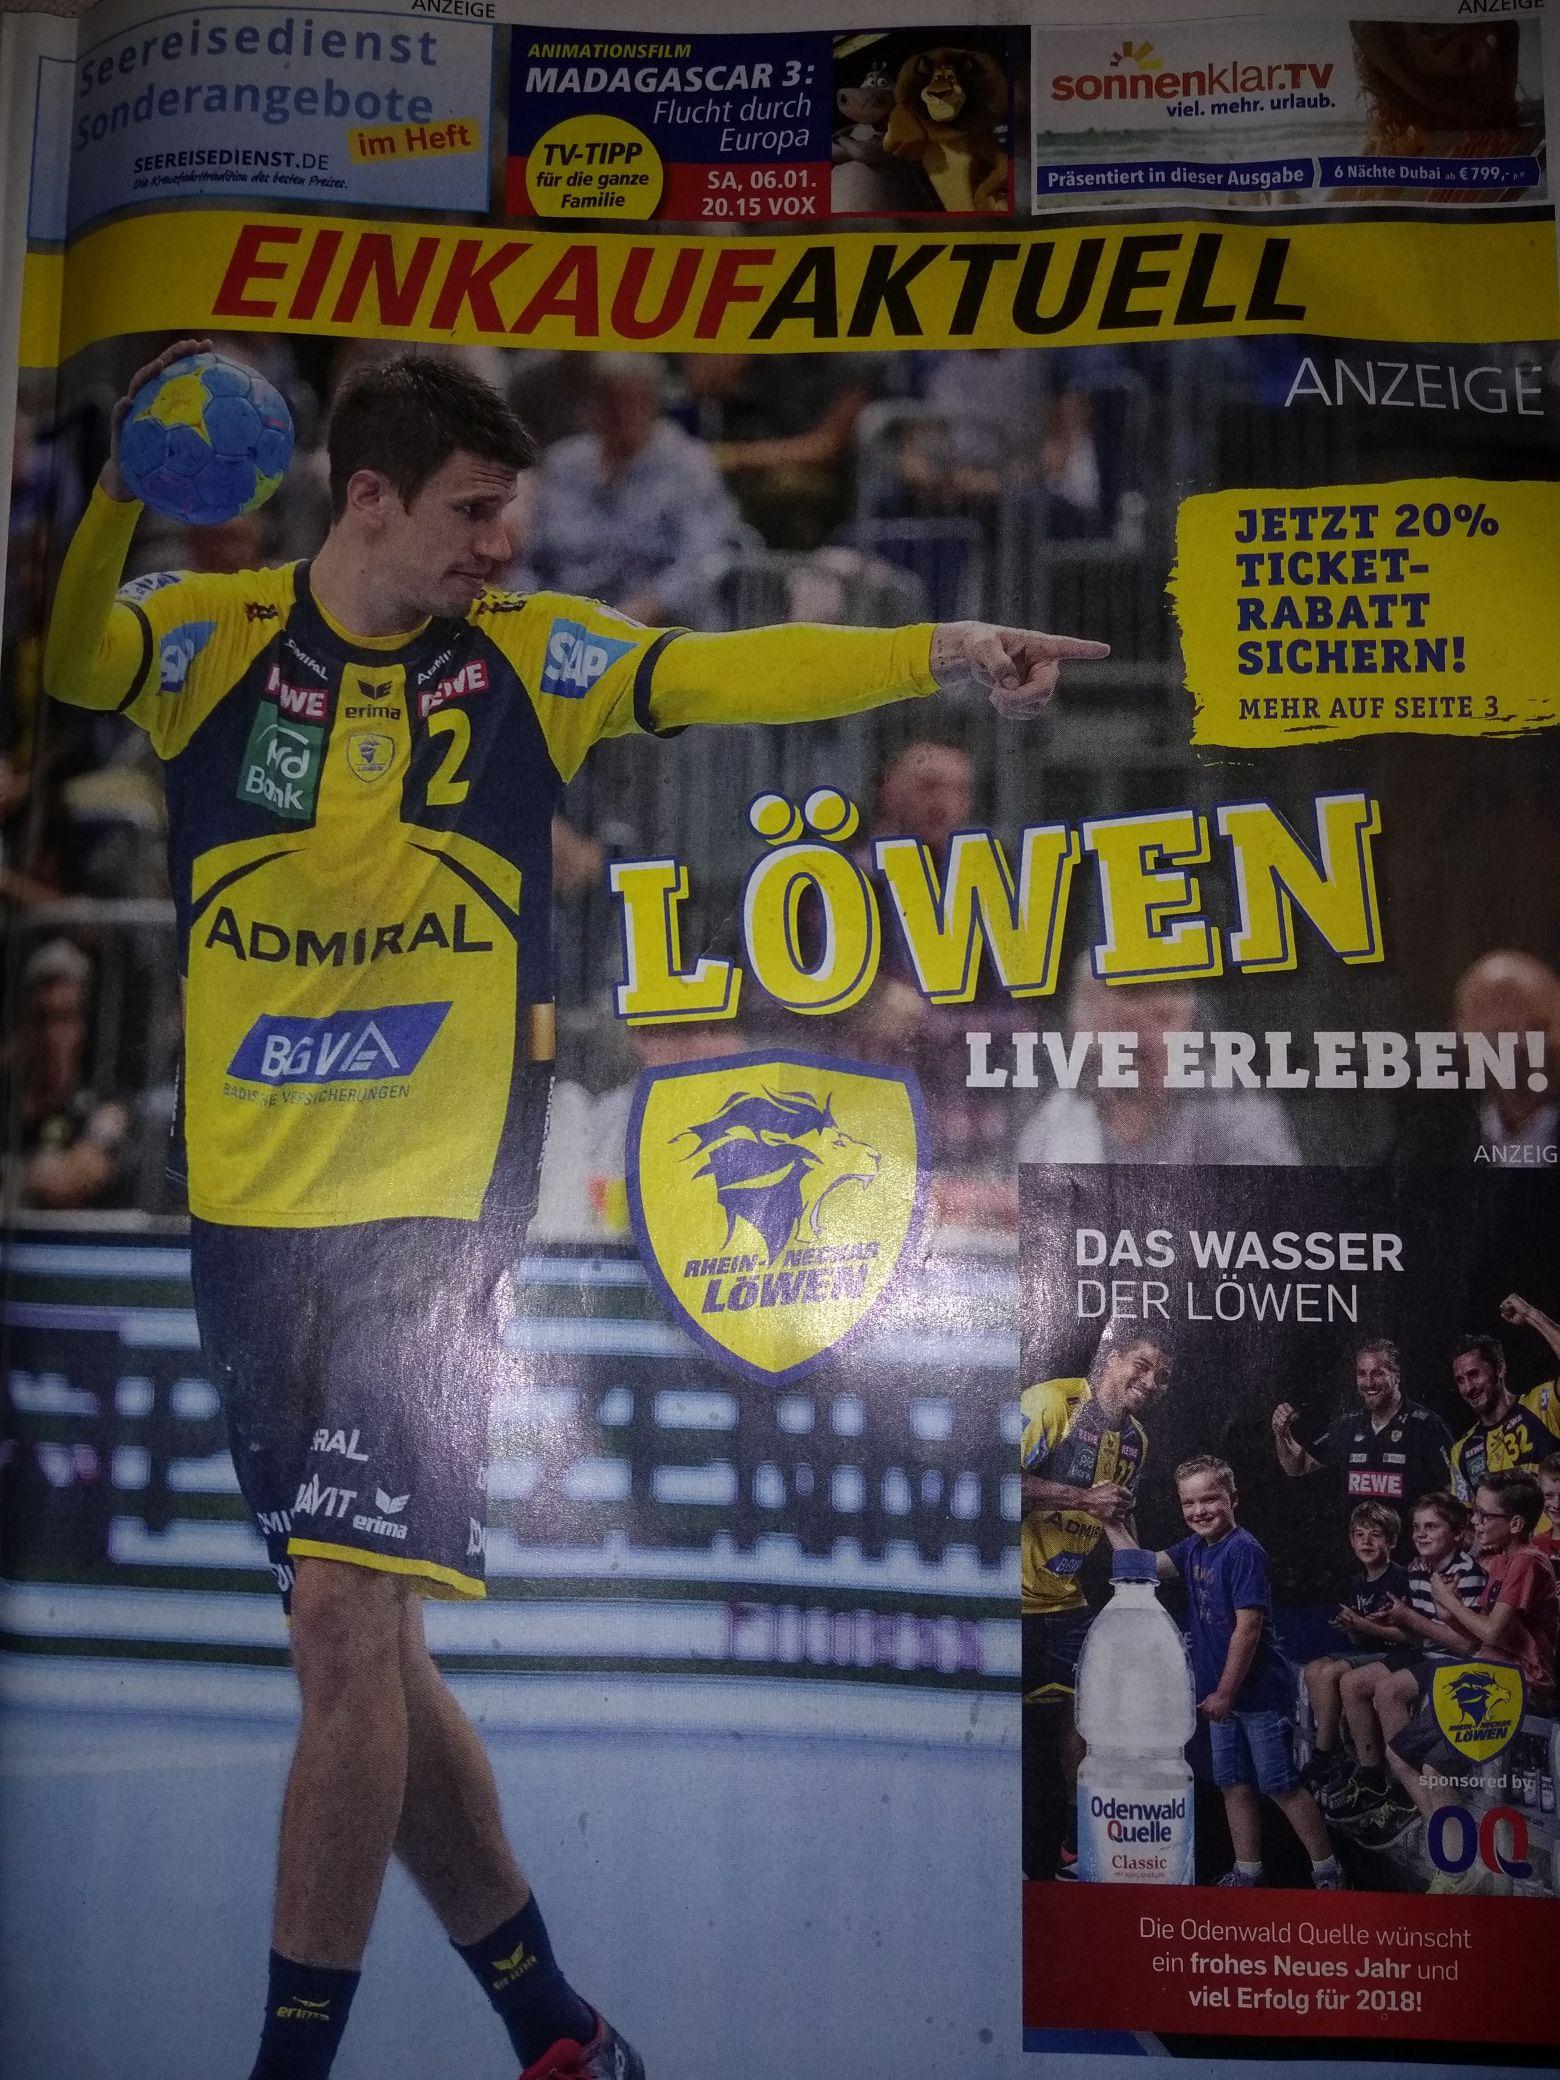 20% Ticketrabatt Handball Pokalspiel Rhein-Neckarlöwen gegen Leipzig